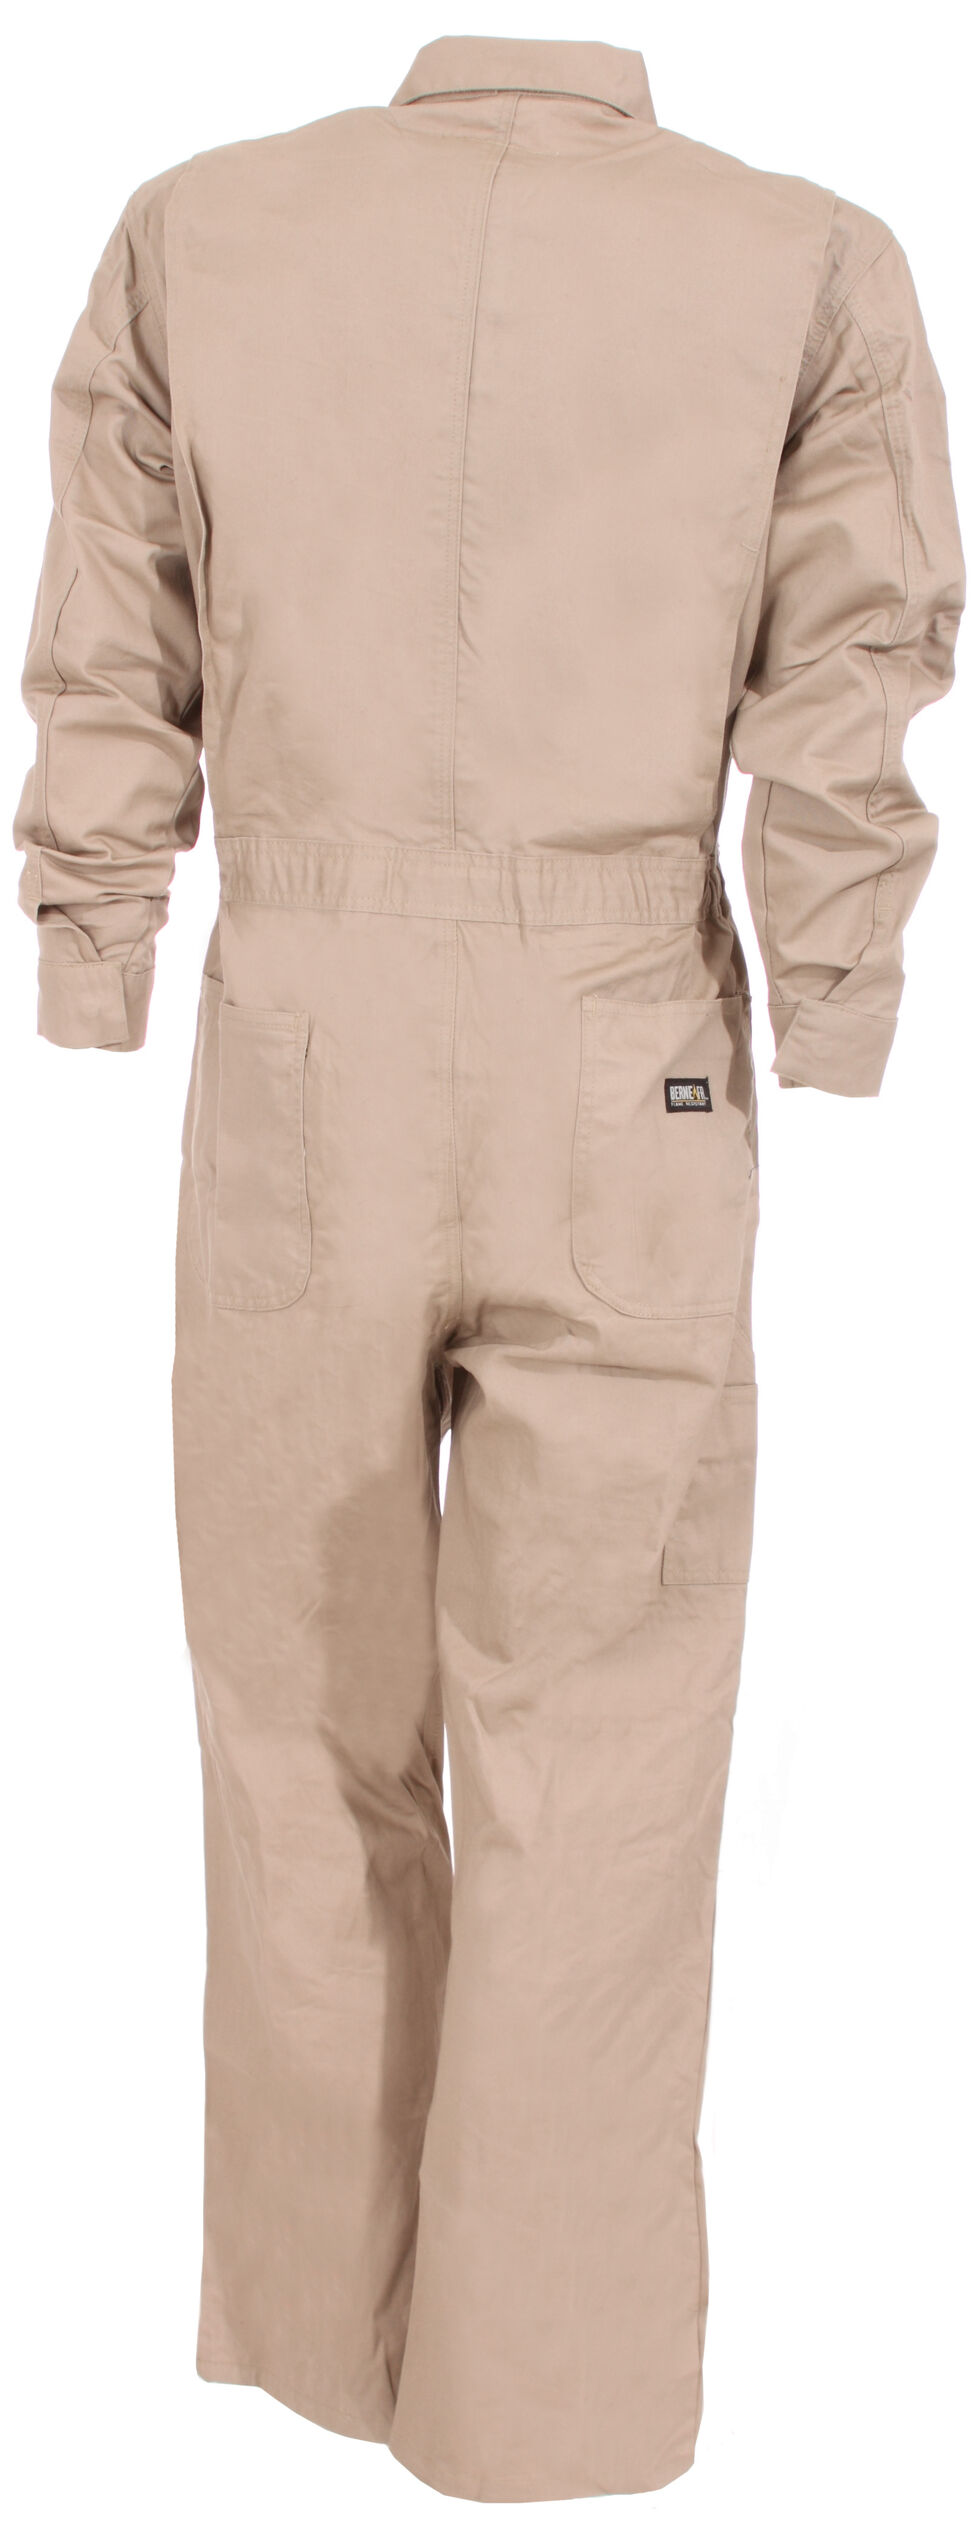 Berne Flame Resistant Deluxe Coveralls, Khaki, hi-res